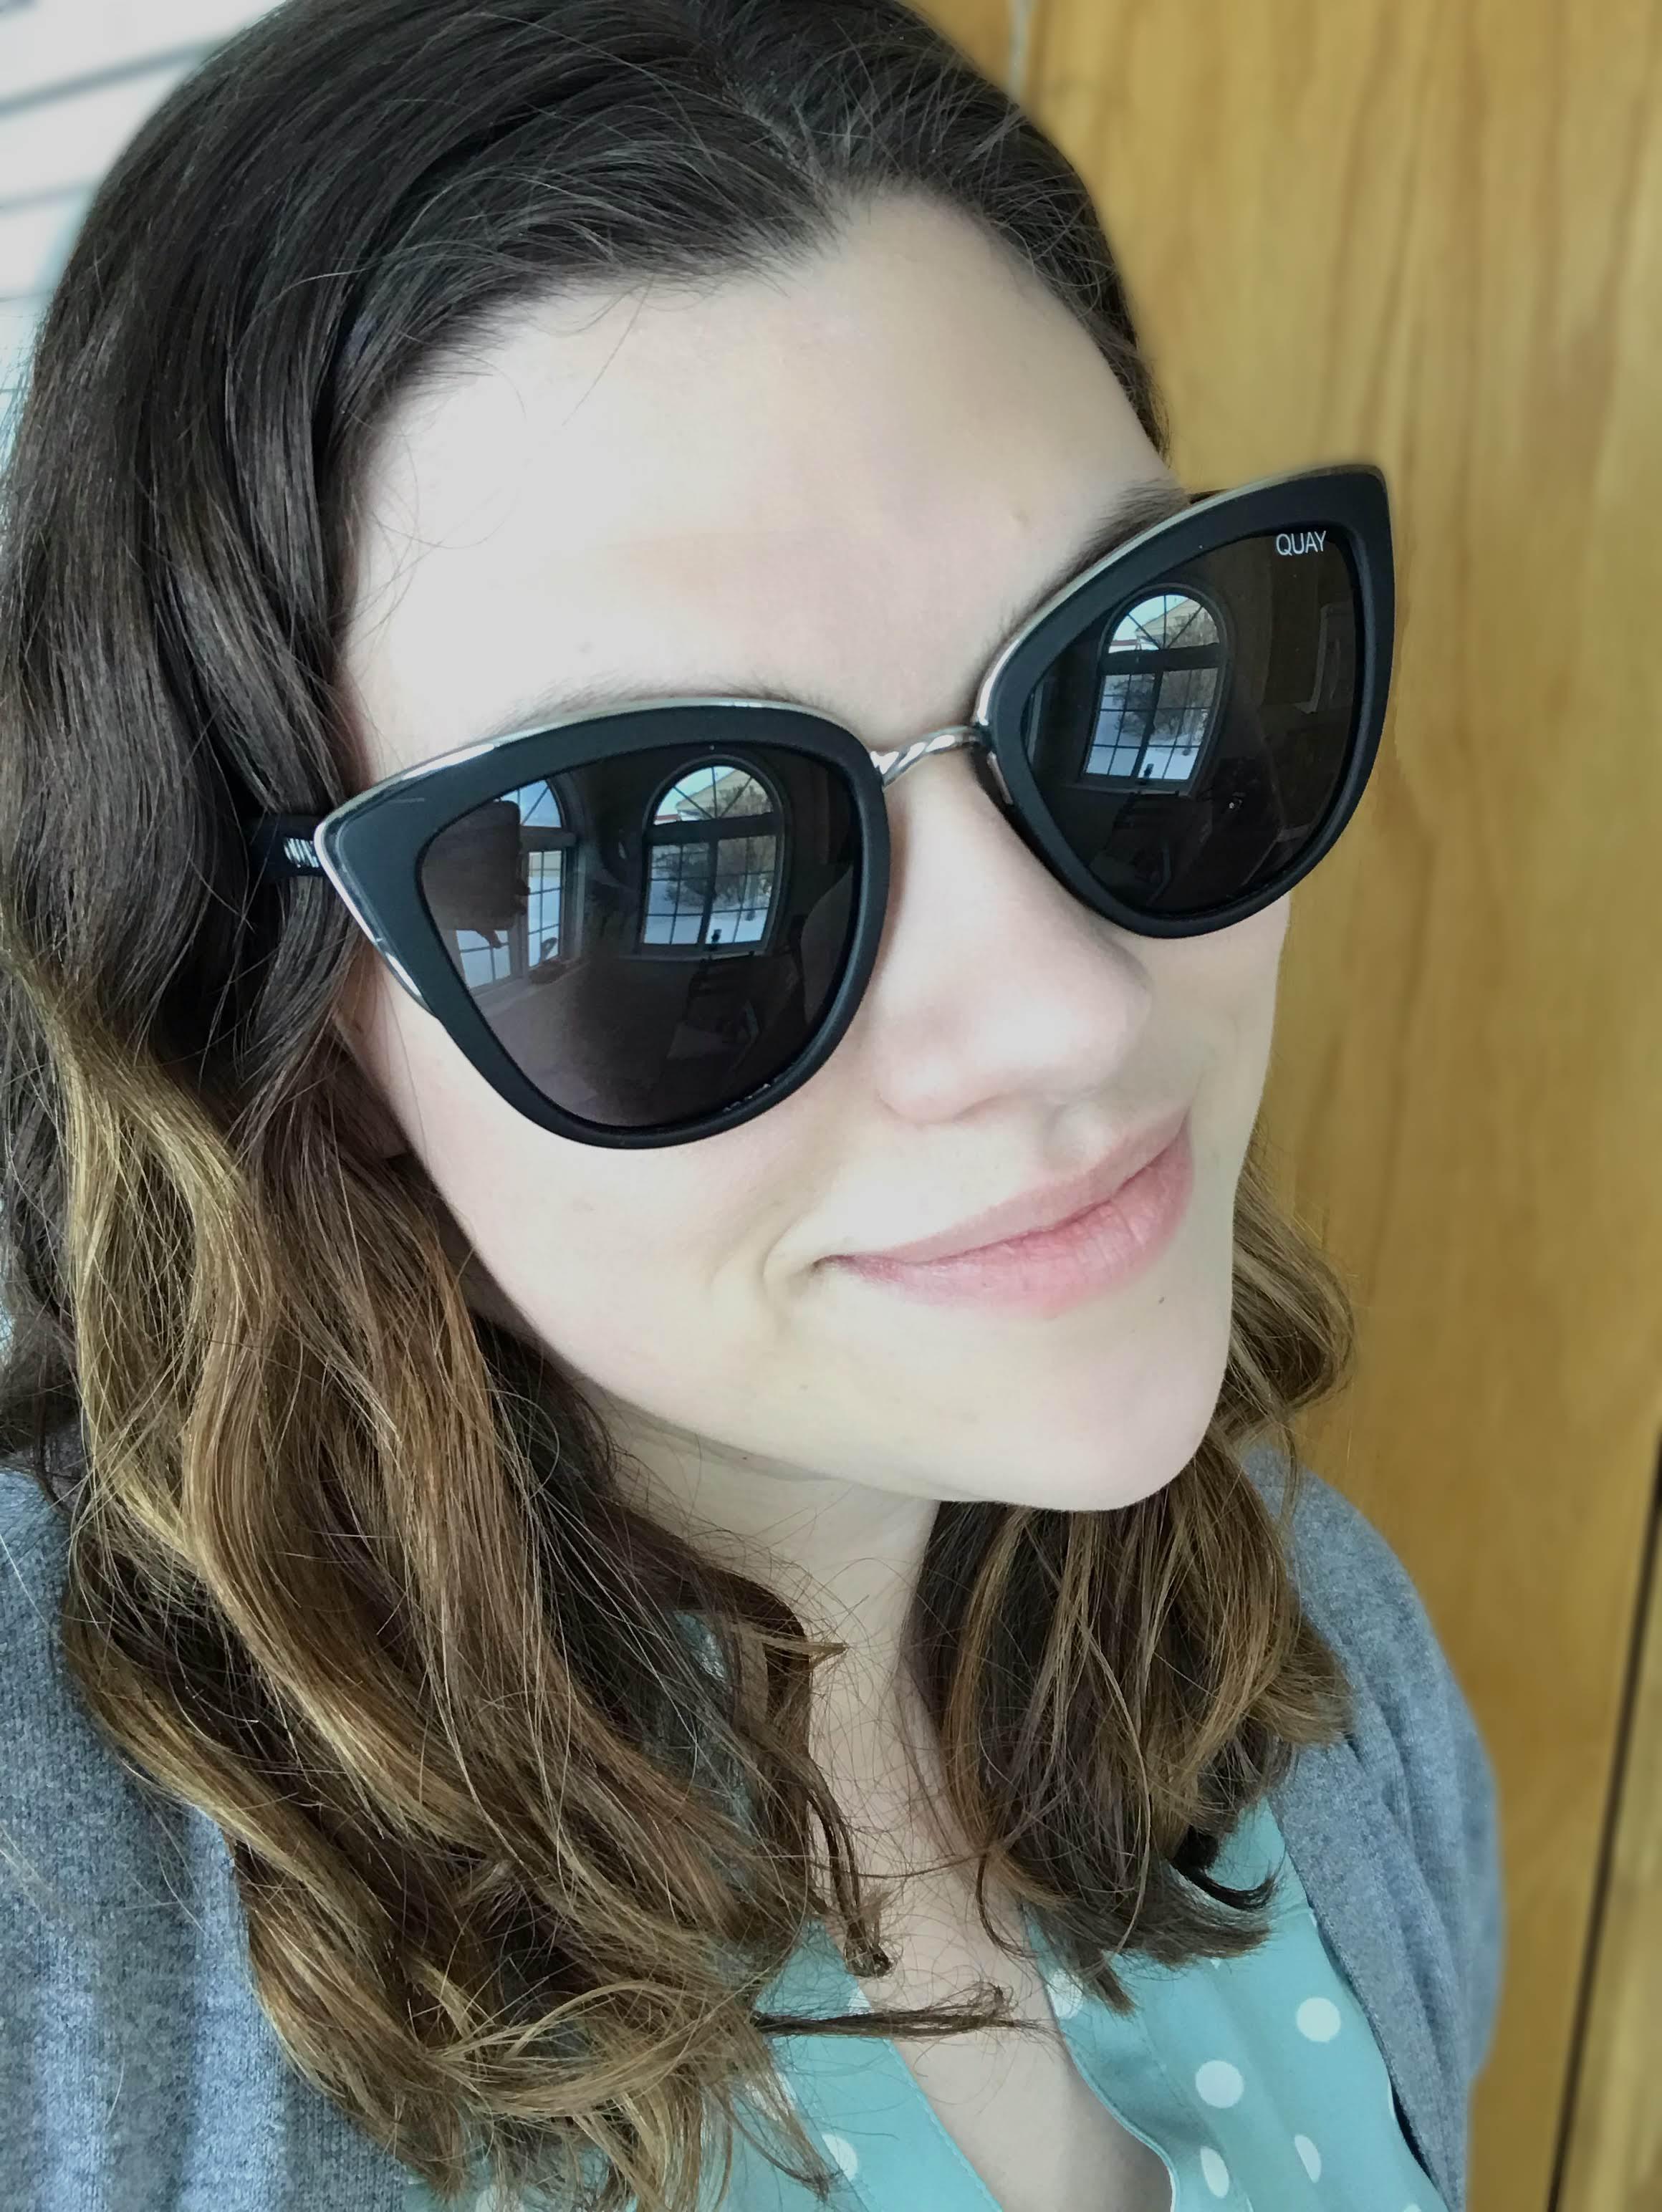 quay-my-girl-sunglasses